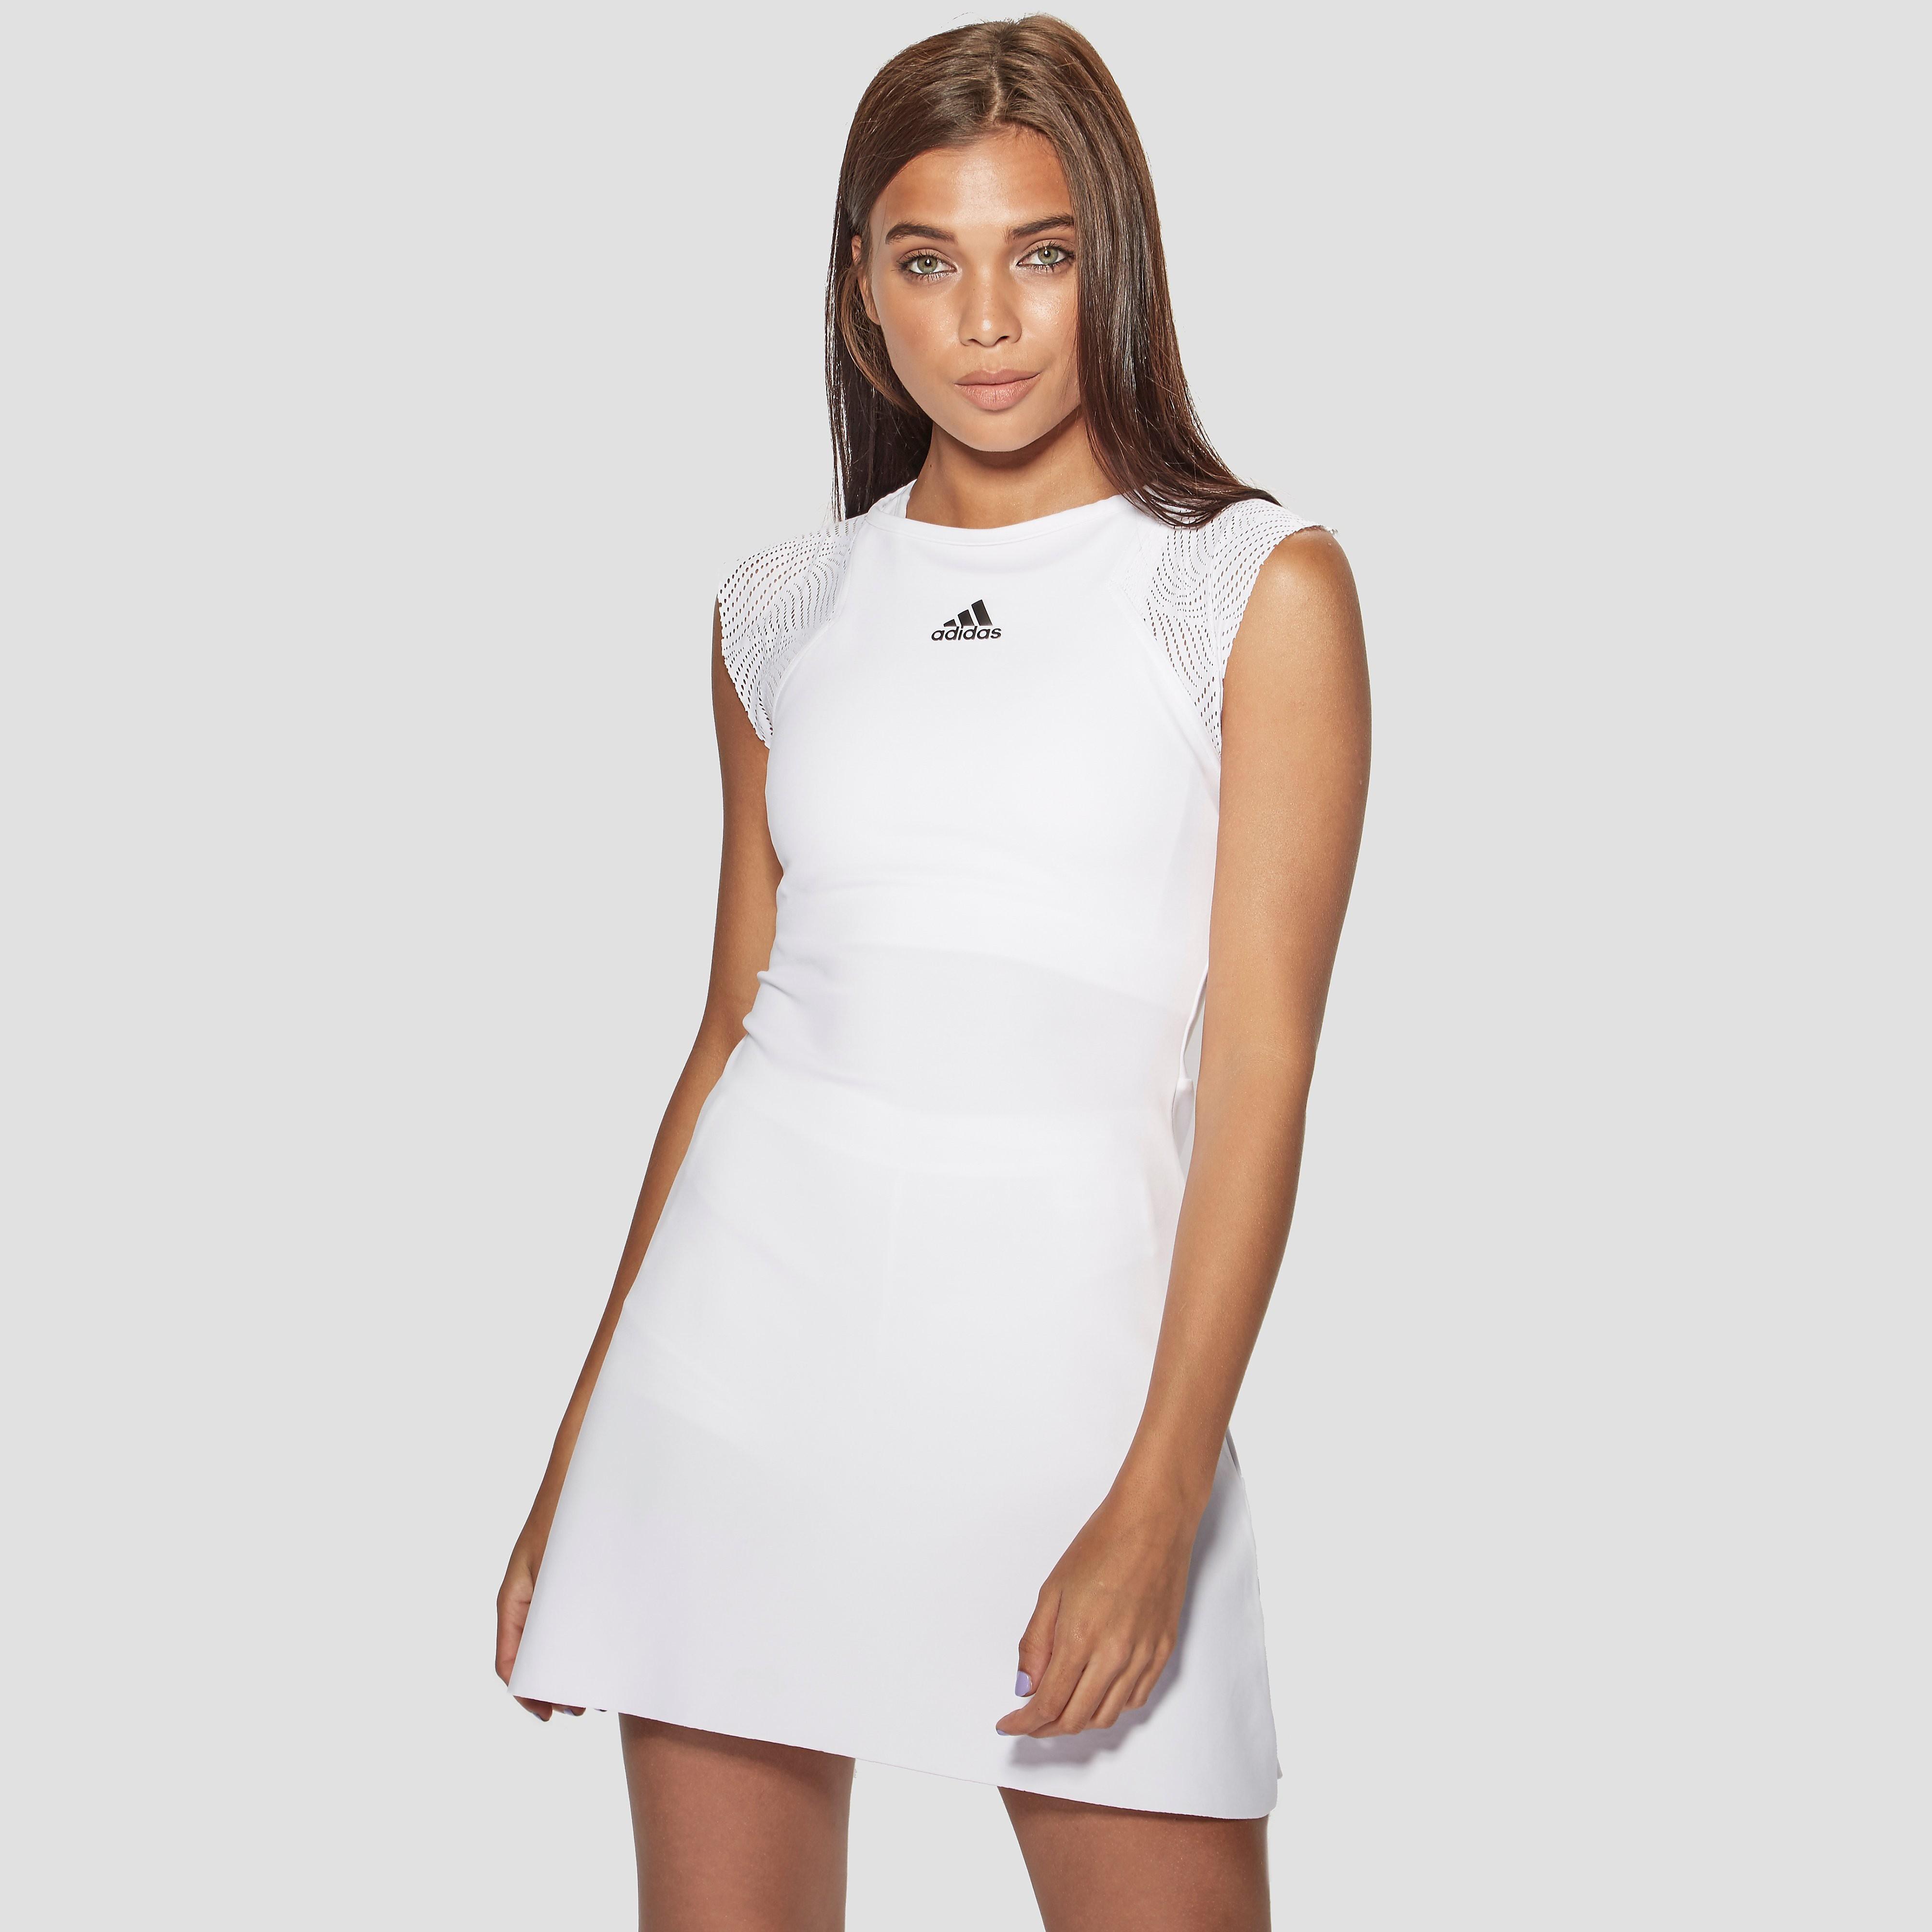 adidas London Women's Tennis Dress